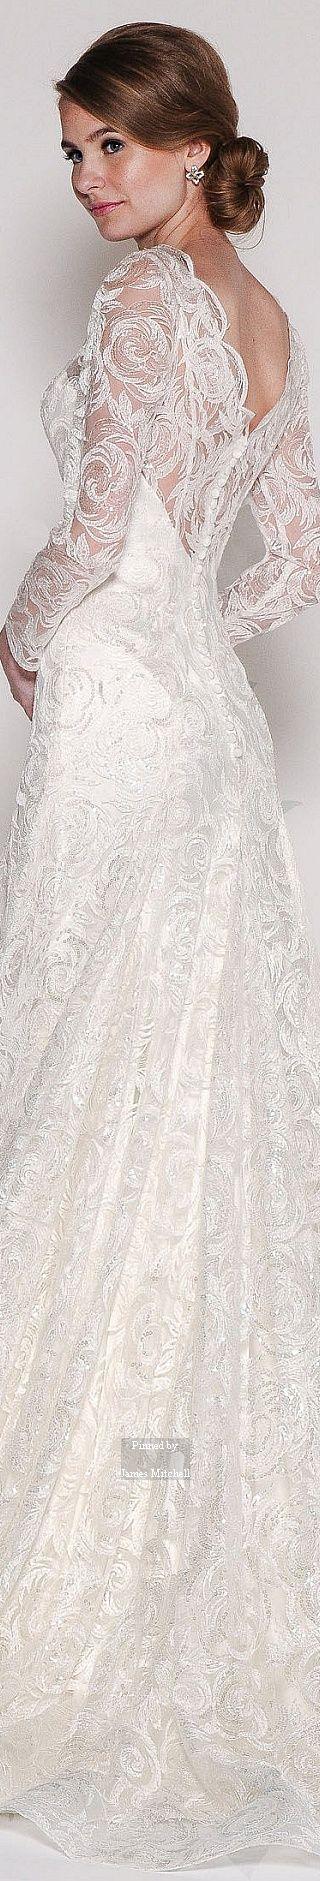 81 best 2016 Bridal Gowns images on Pinterest   Wedding dressses ...